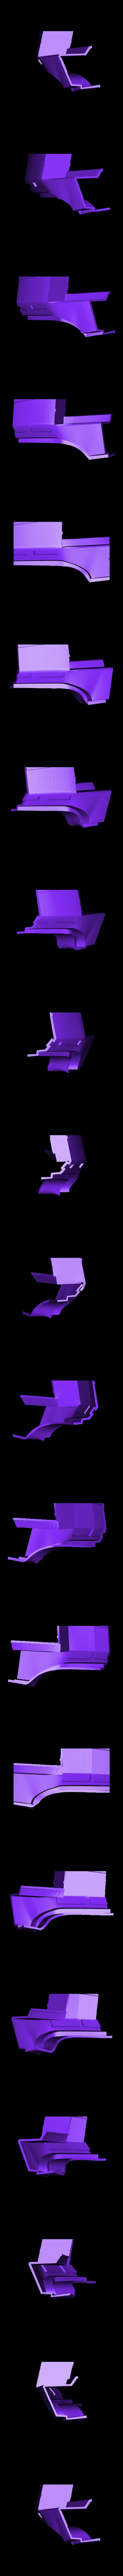 Part_10_v2.stl Download free STL file Battlestar Galactica Colonial Viper Pilot Helmet • 3D printing object, VillainousPropShop